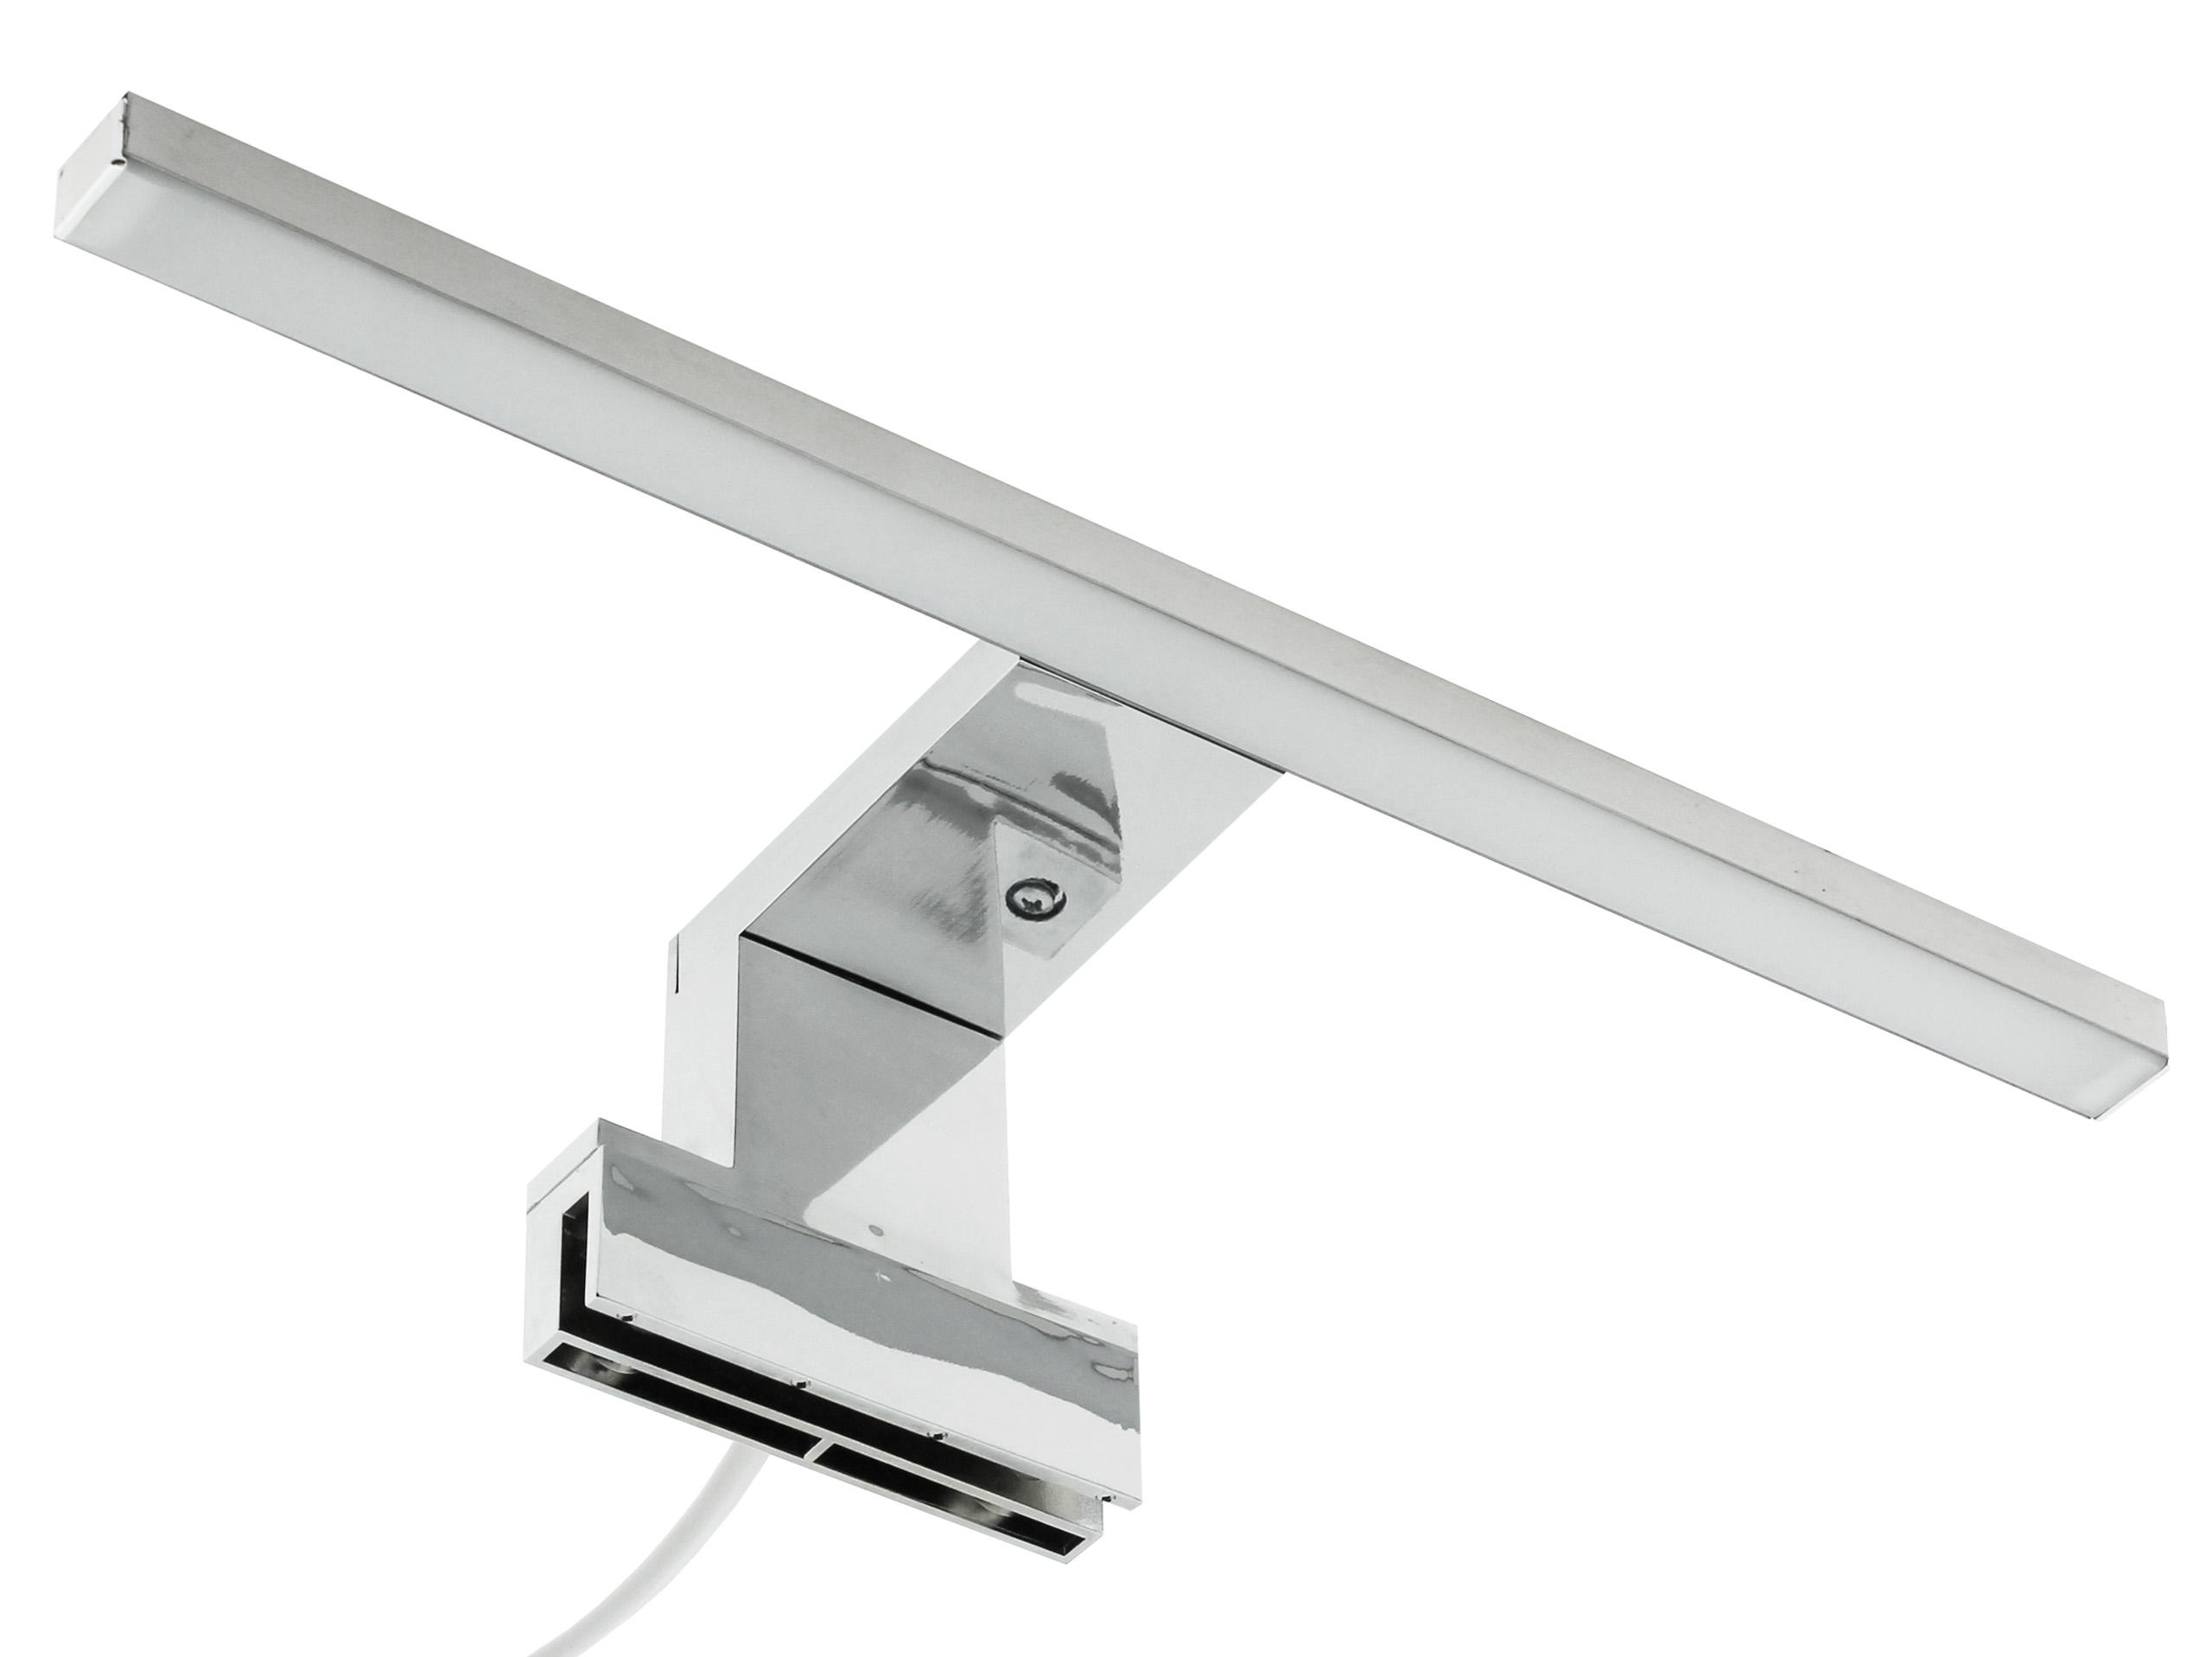 Furnika LED Lampa ALA 300 Furnika Barva: aluminium